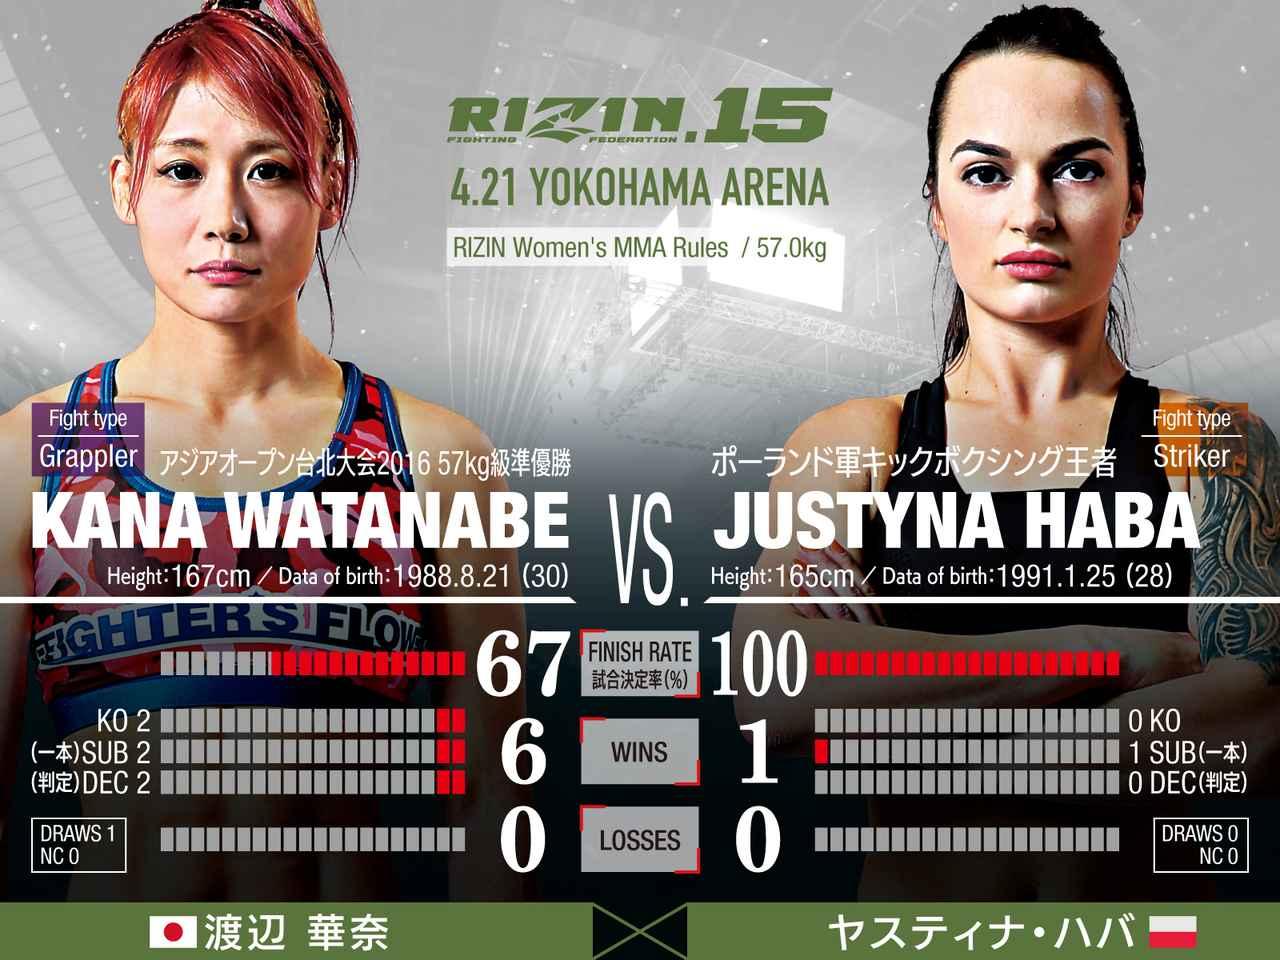 画像1: RIZIN 女子 MMA ルール : 5分 3R(57.0kg)※肘あり